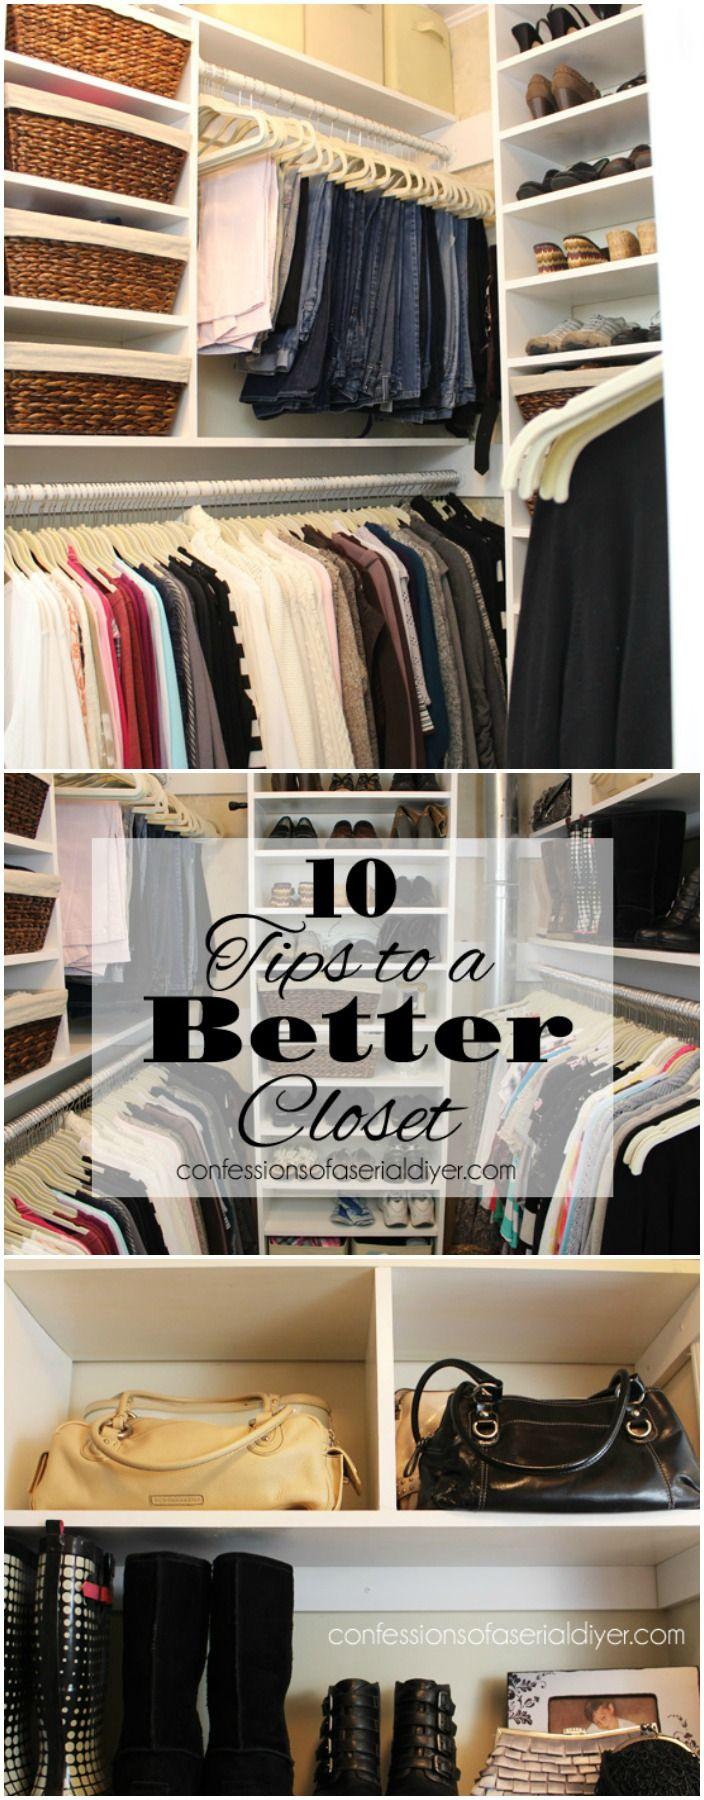 17 Best Images About Closet Vanity Ideas On Pinterest